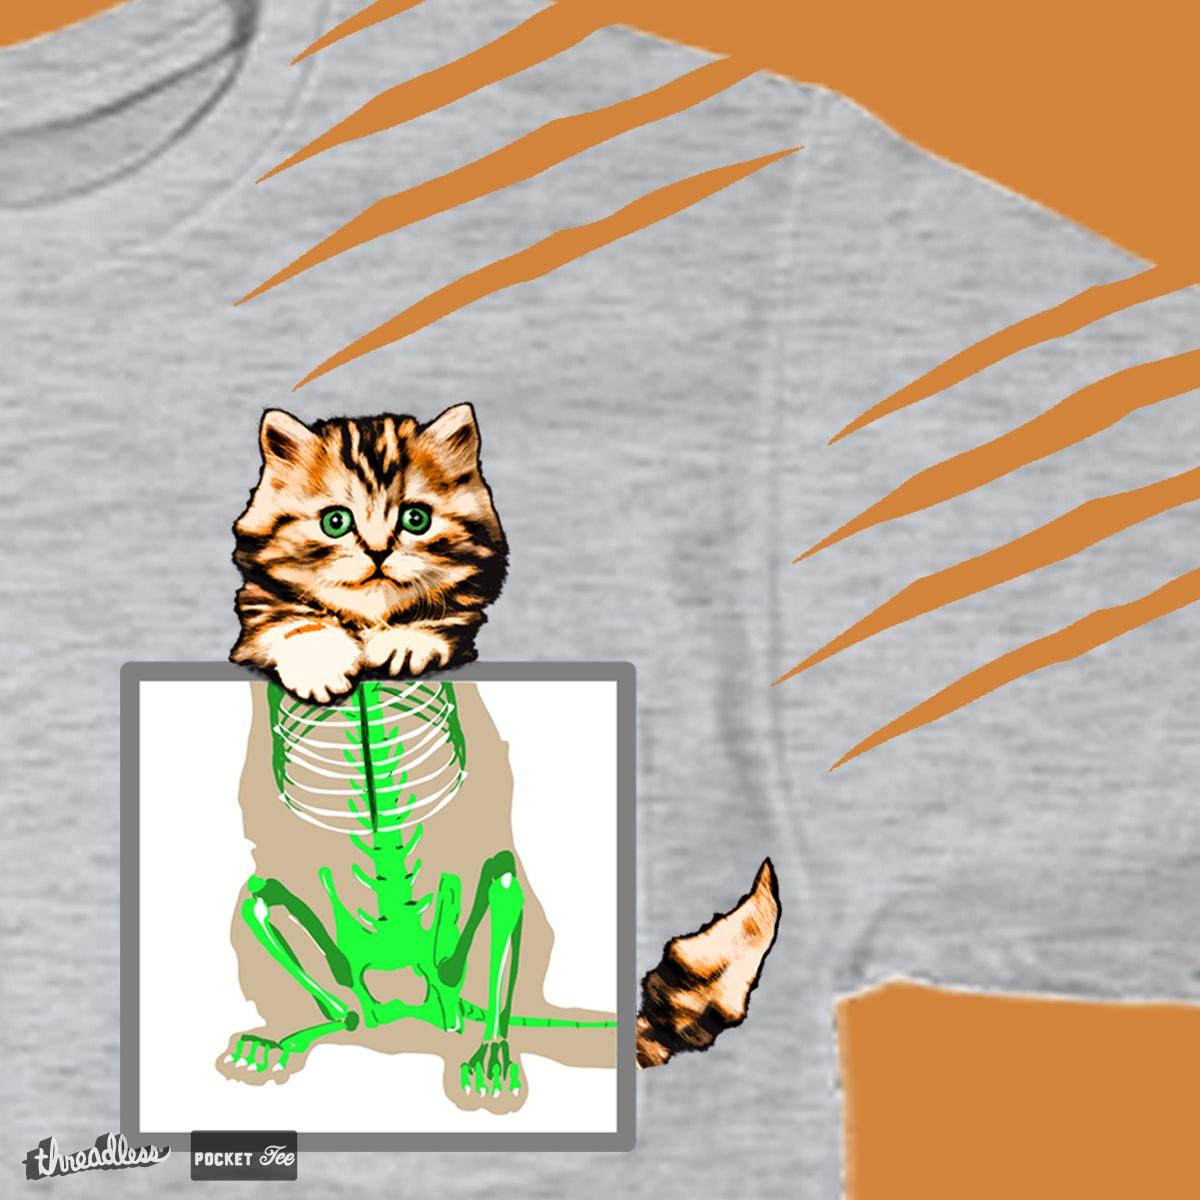 xray cat by Alektheone on Threadless